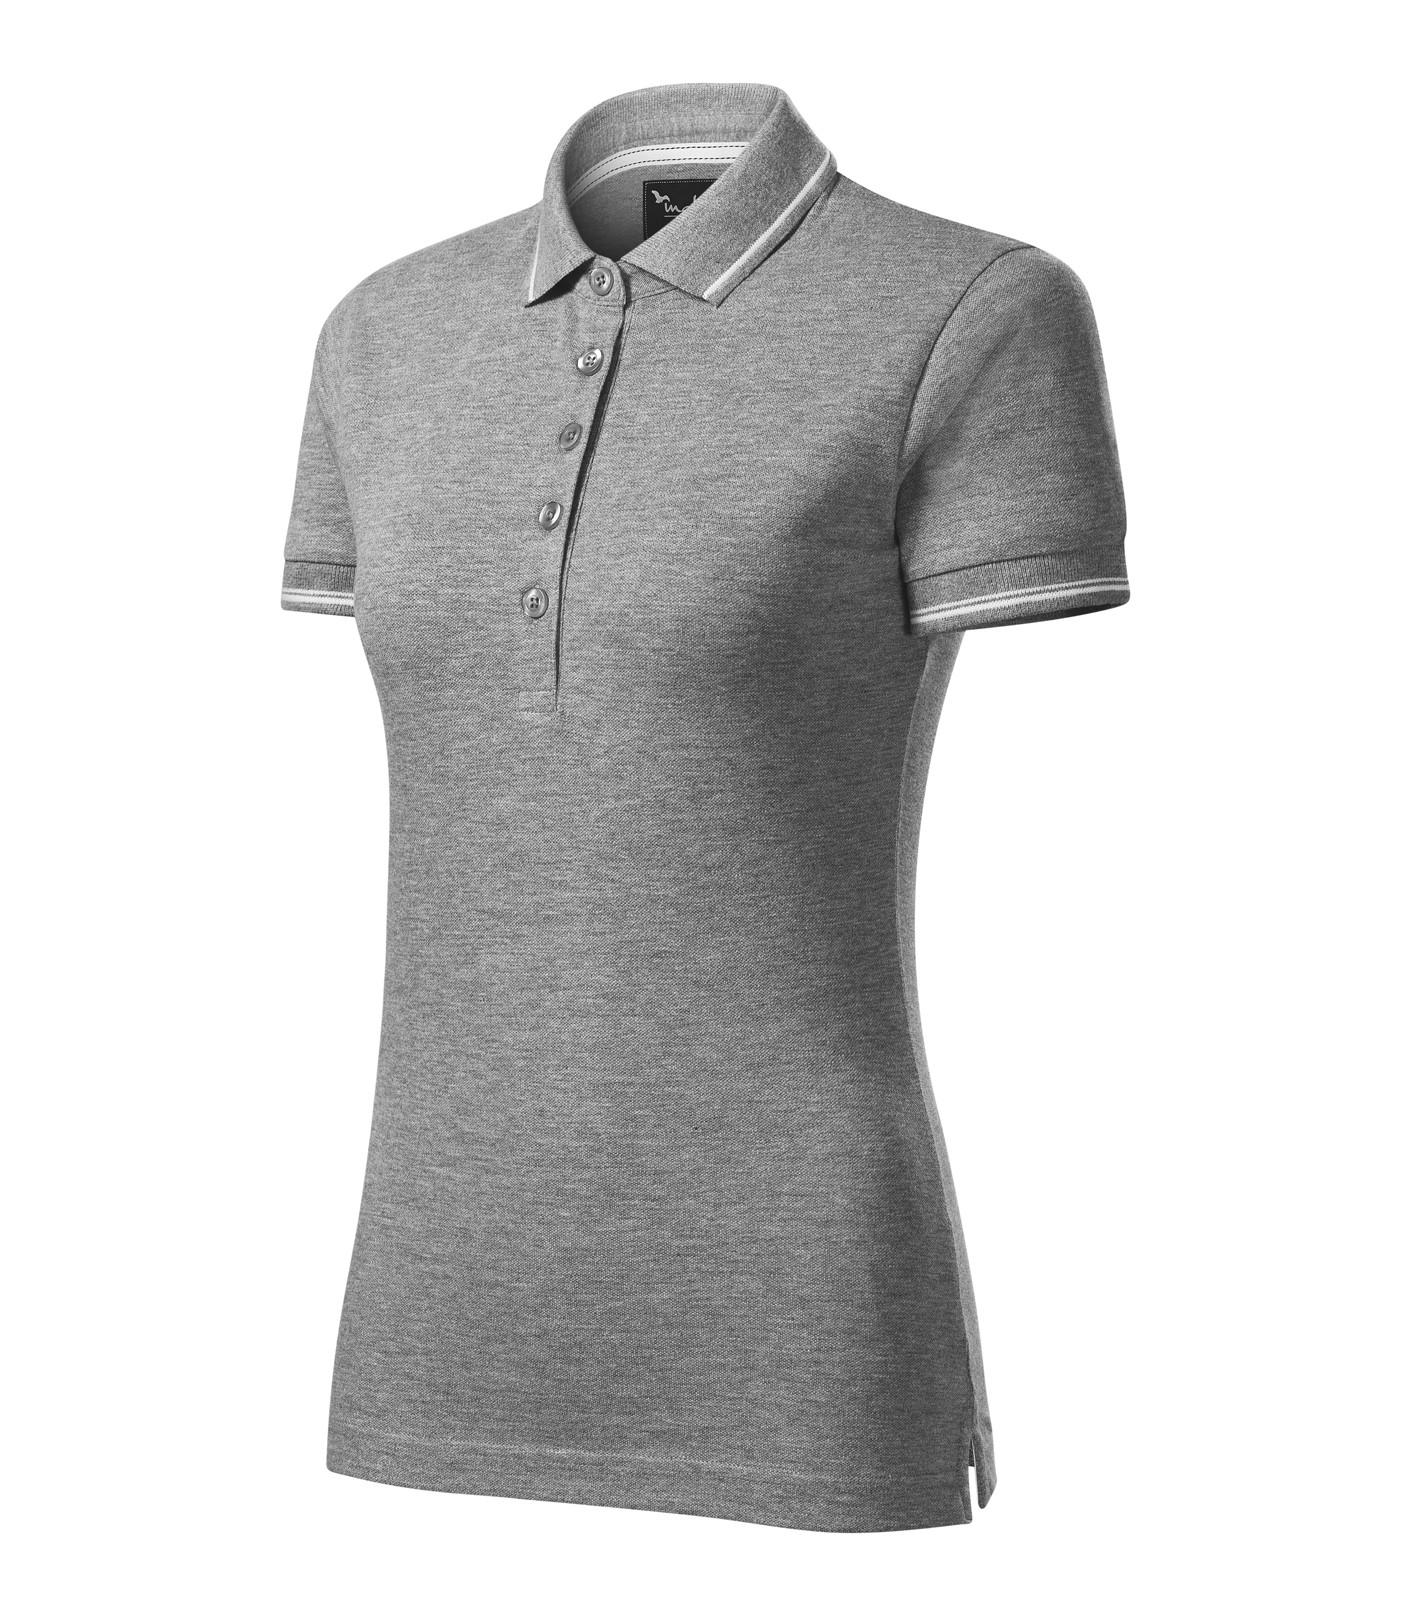 Polo Shirt women's Malfinipremium Perfection plain - Dark Gray Melange / 2XL